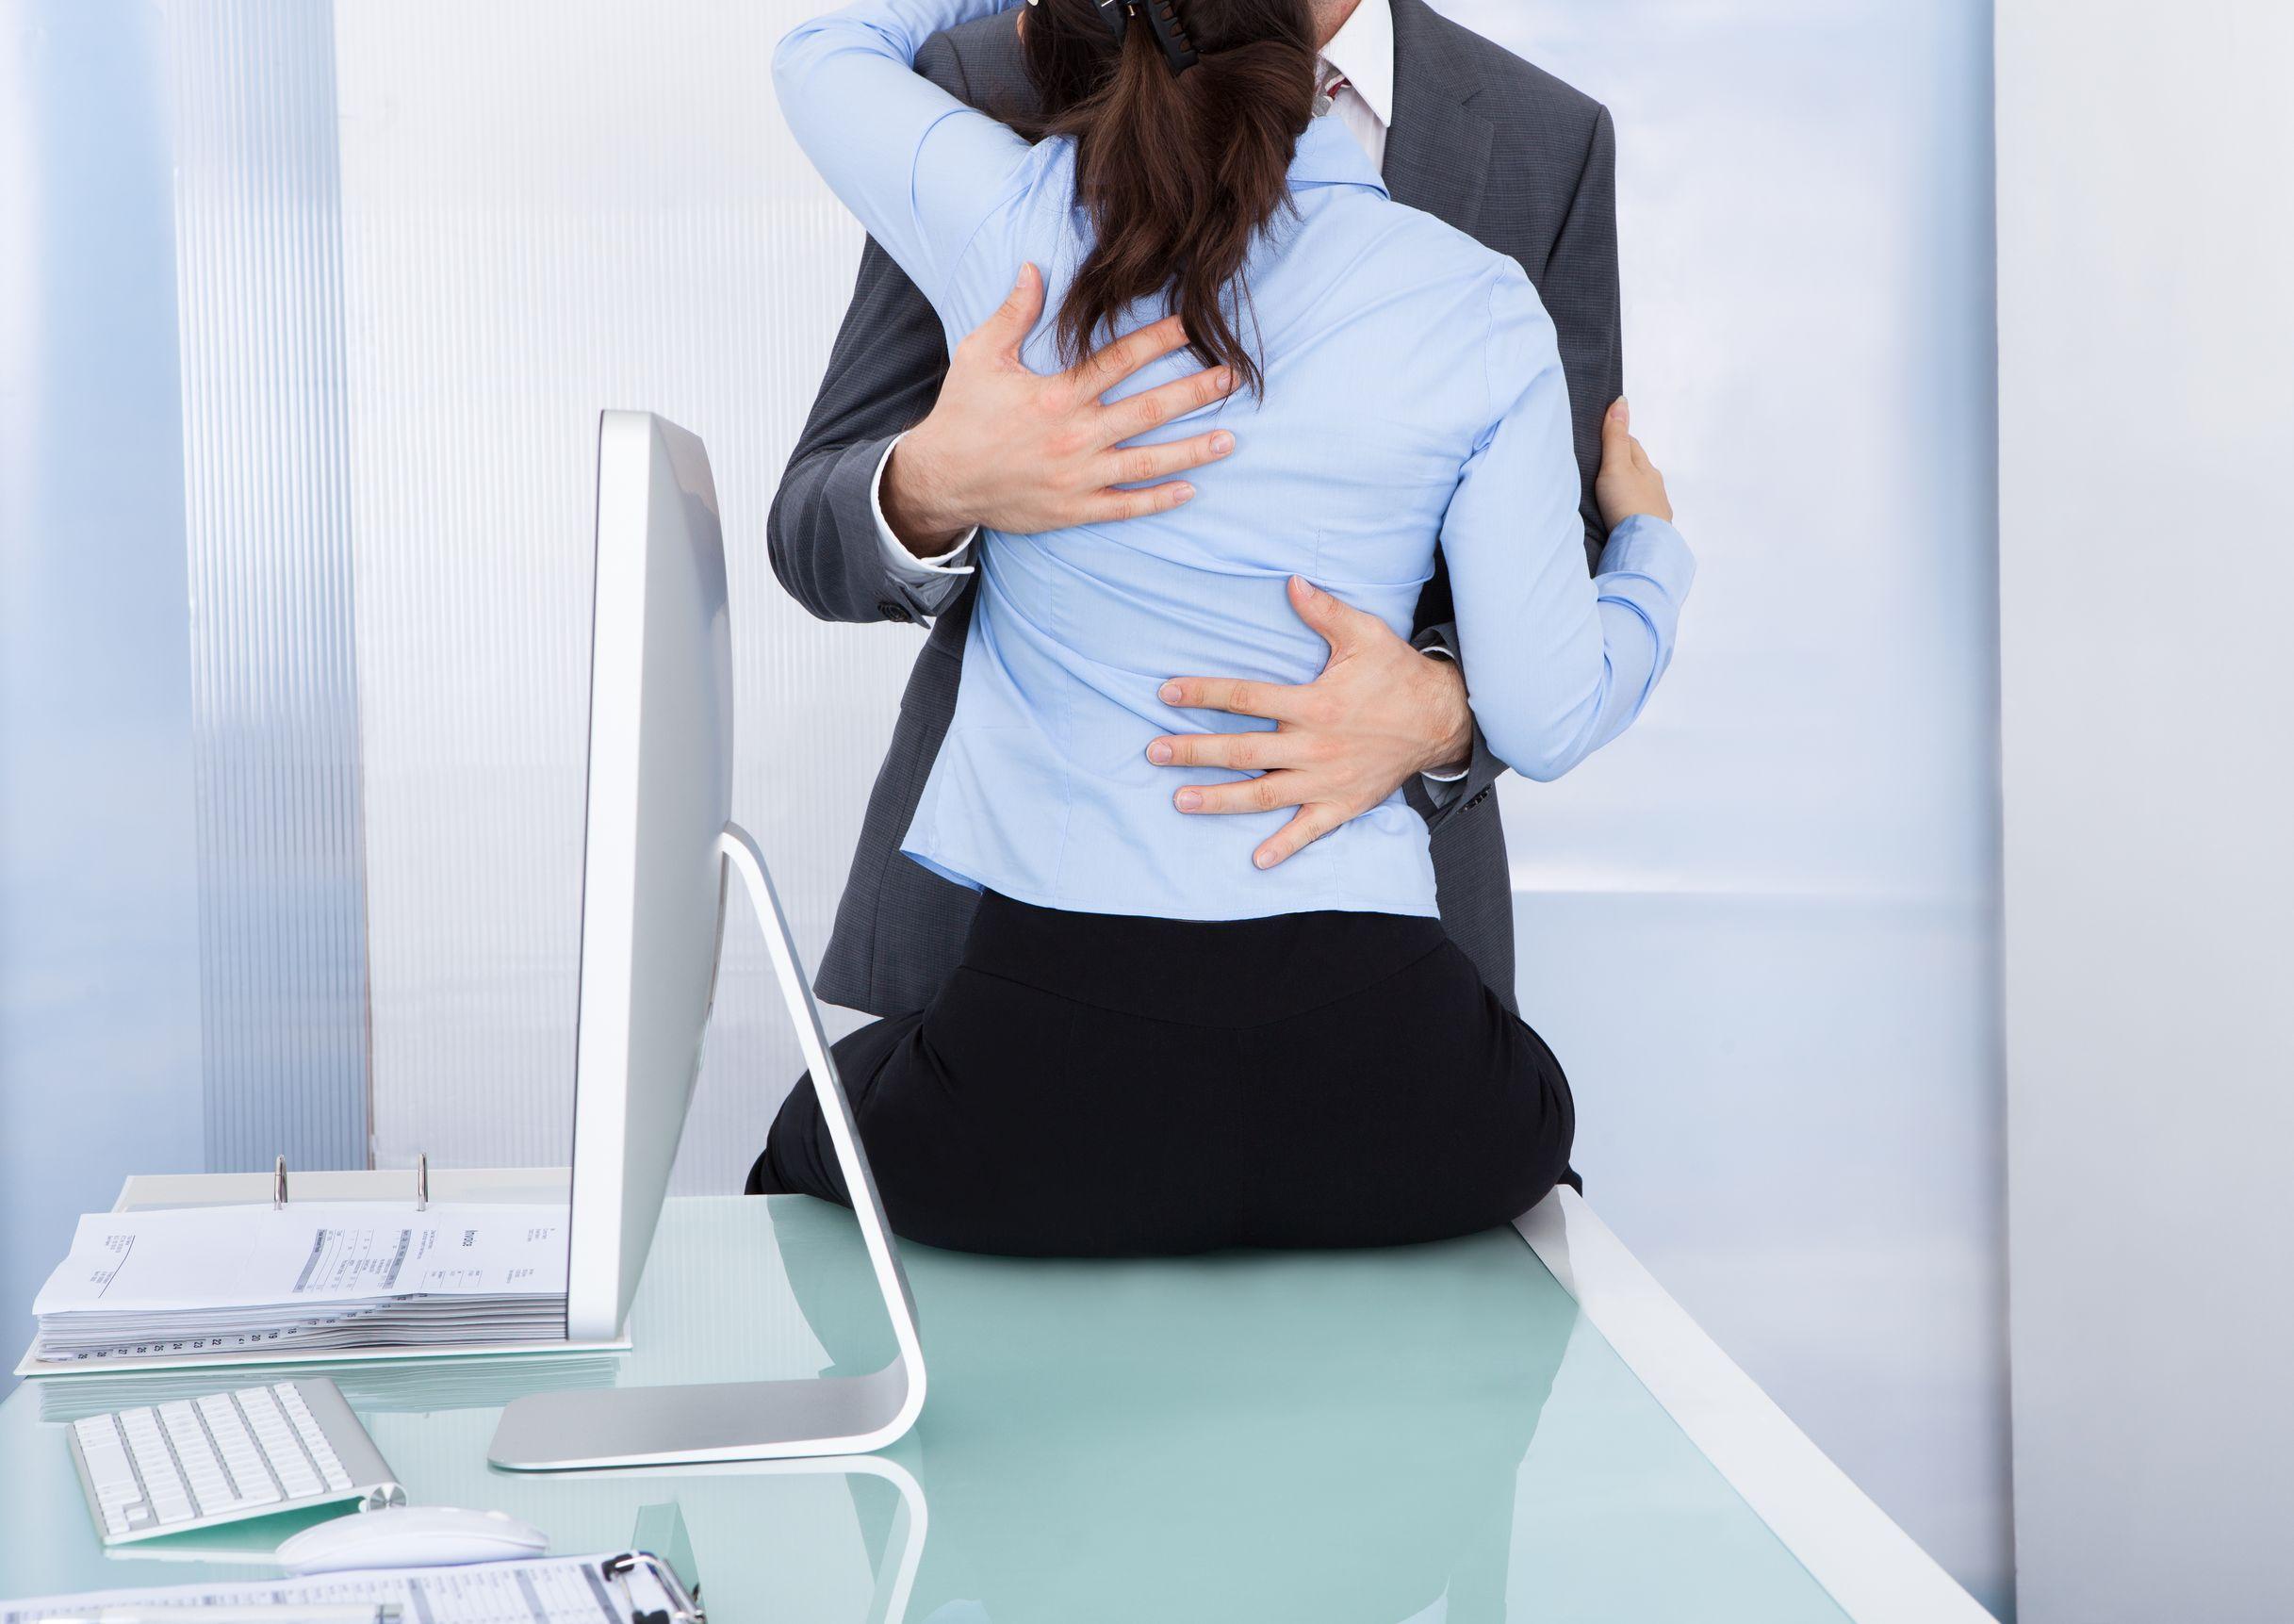 5 Common Cheating Spouse Behaviors